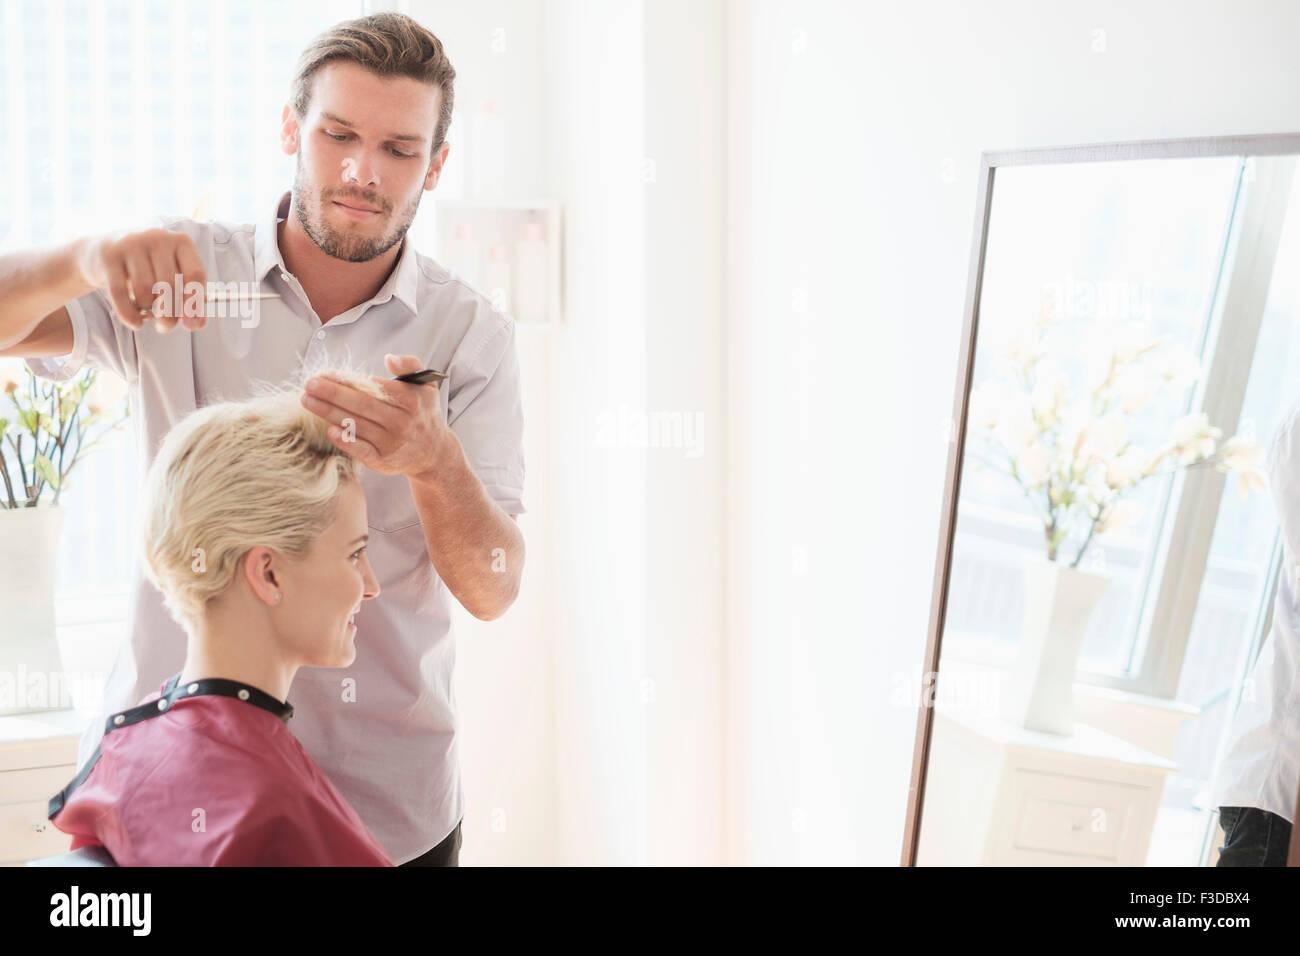 Friseur schneiden das Haar der Frau Stockbild